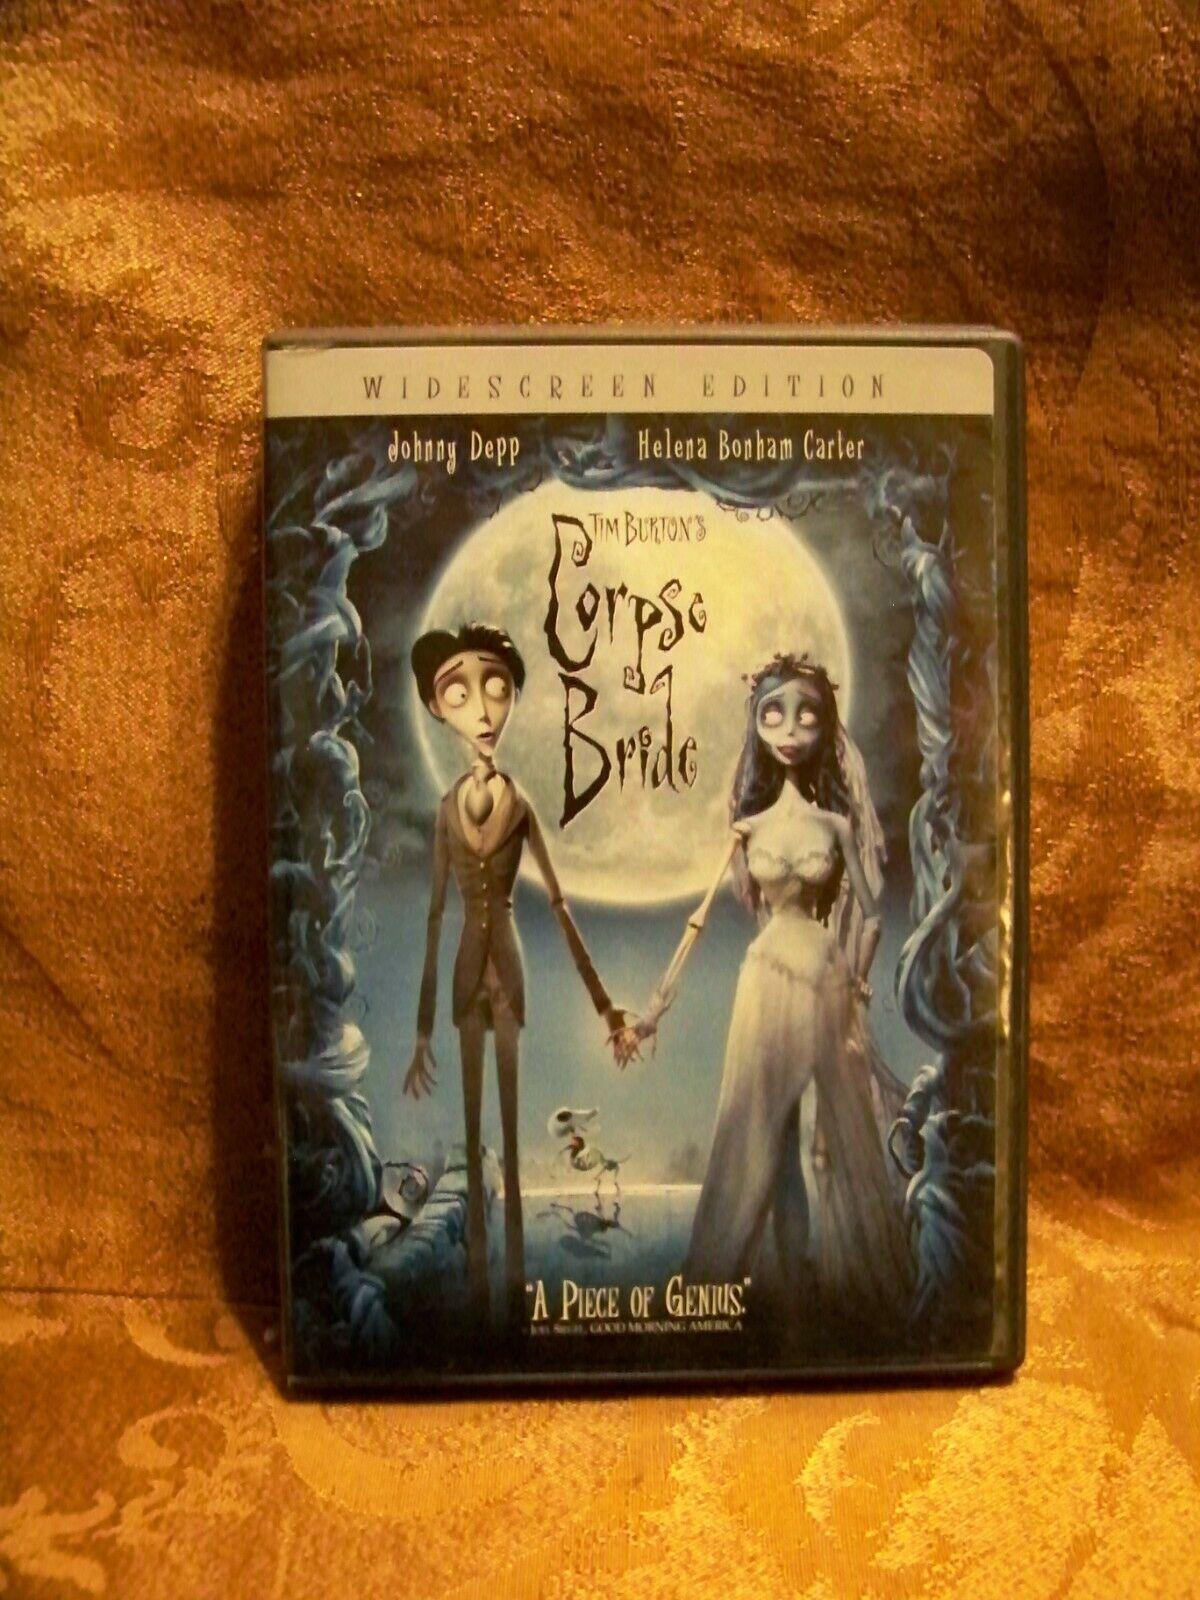 Tim Burtons Corpse Bride DVD, 2006, Widescreen  - $6.99